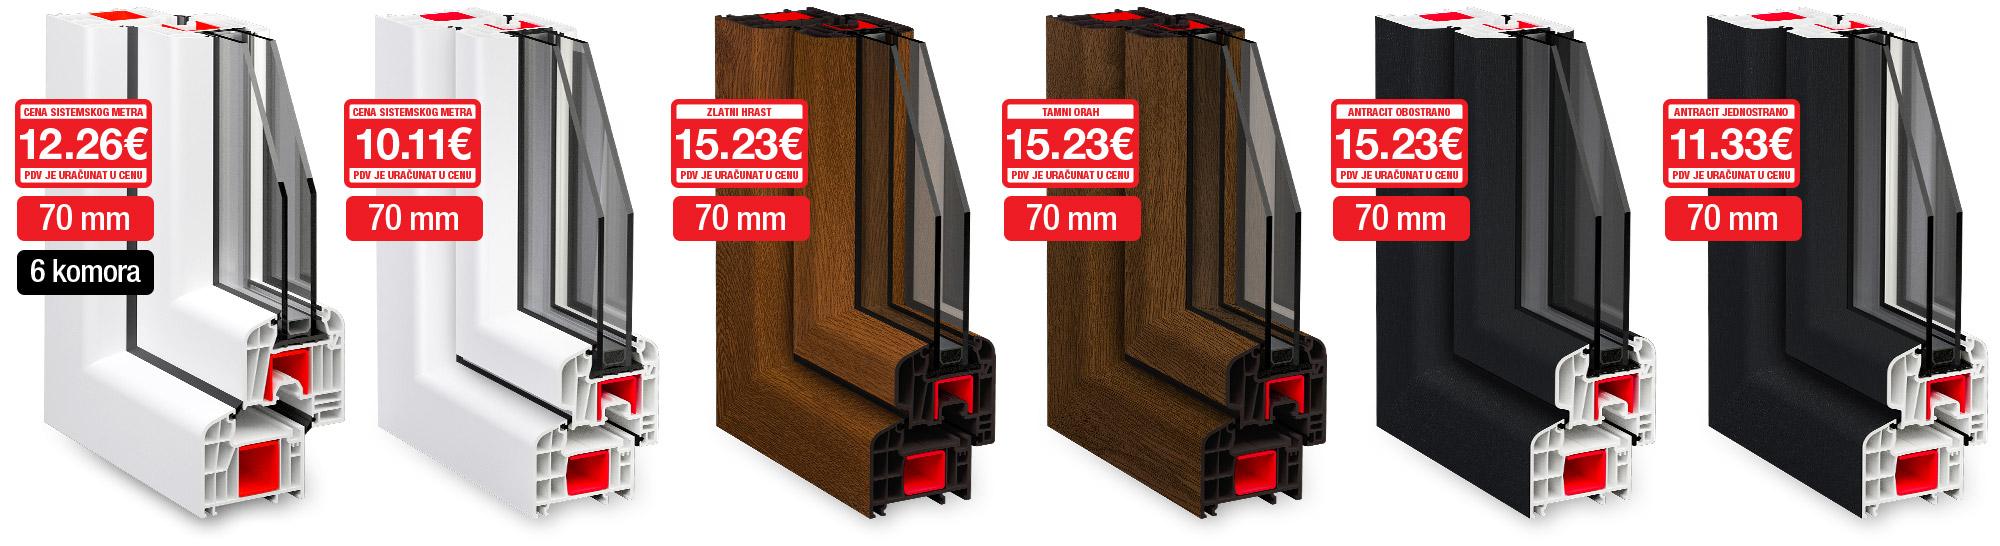 Sunny Plast PVC sistemi za prozore i vrata - sistemski metar